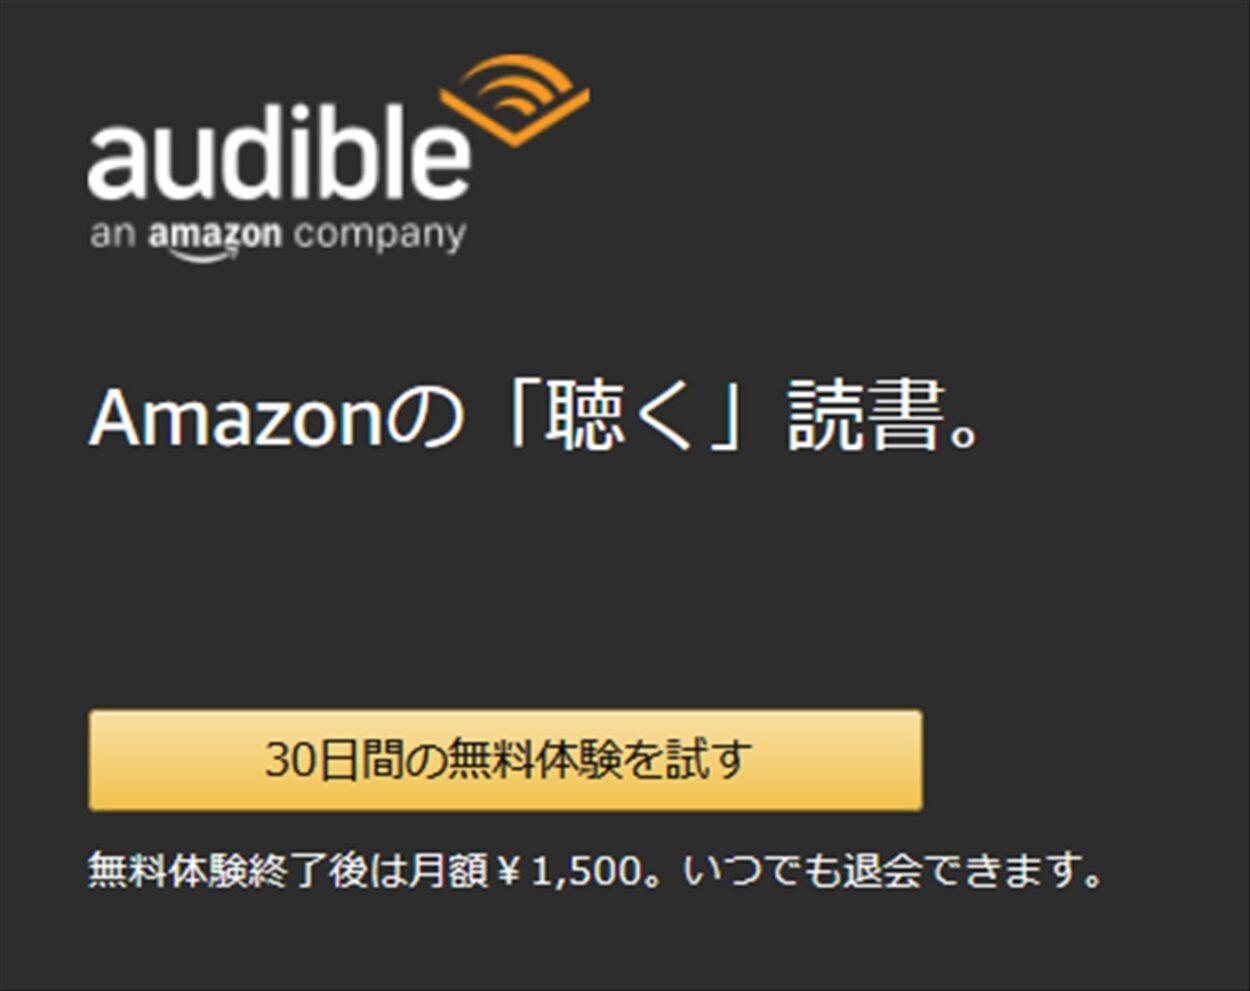 Audibleの無料体験表記が出ていれば再度無料体験が可能